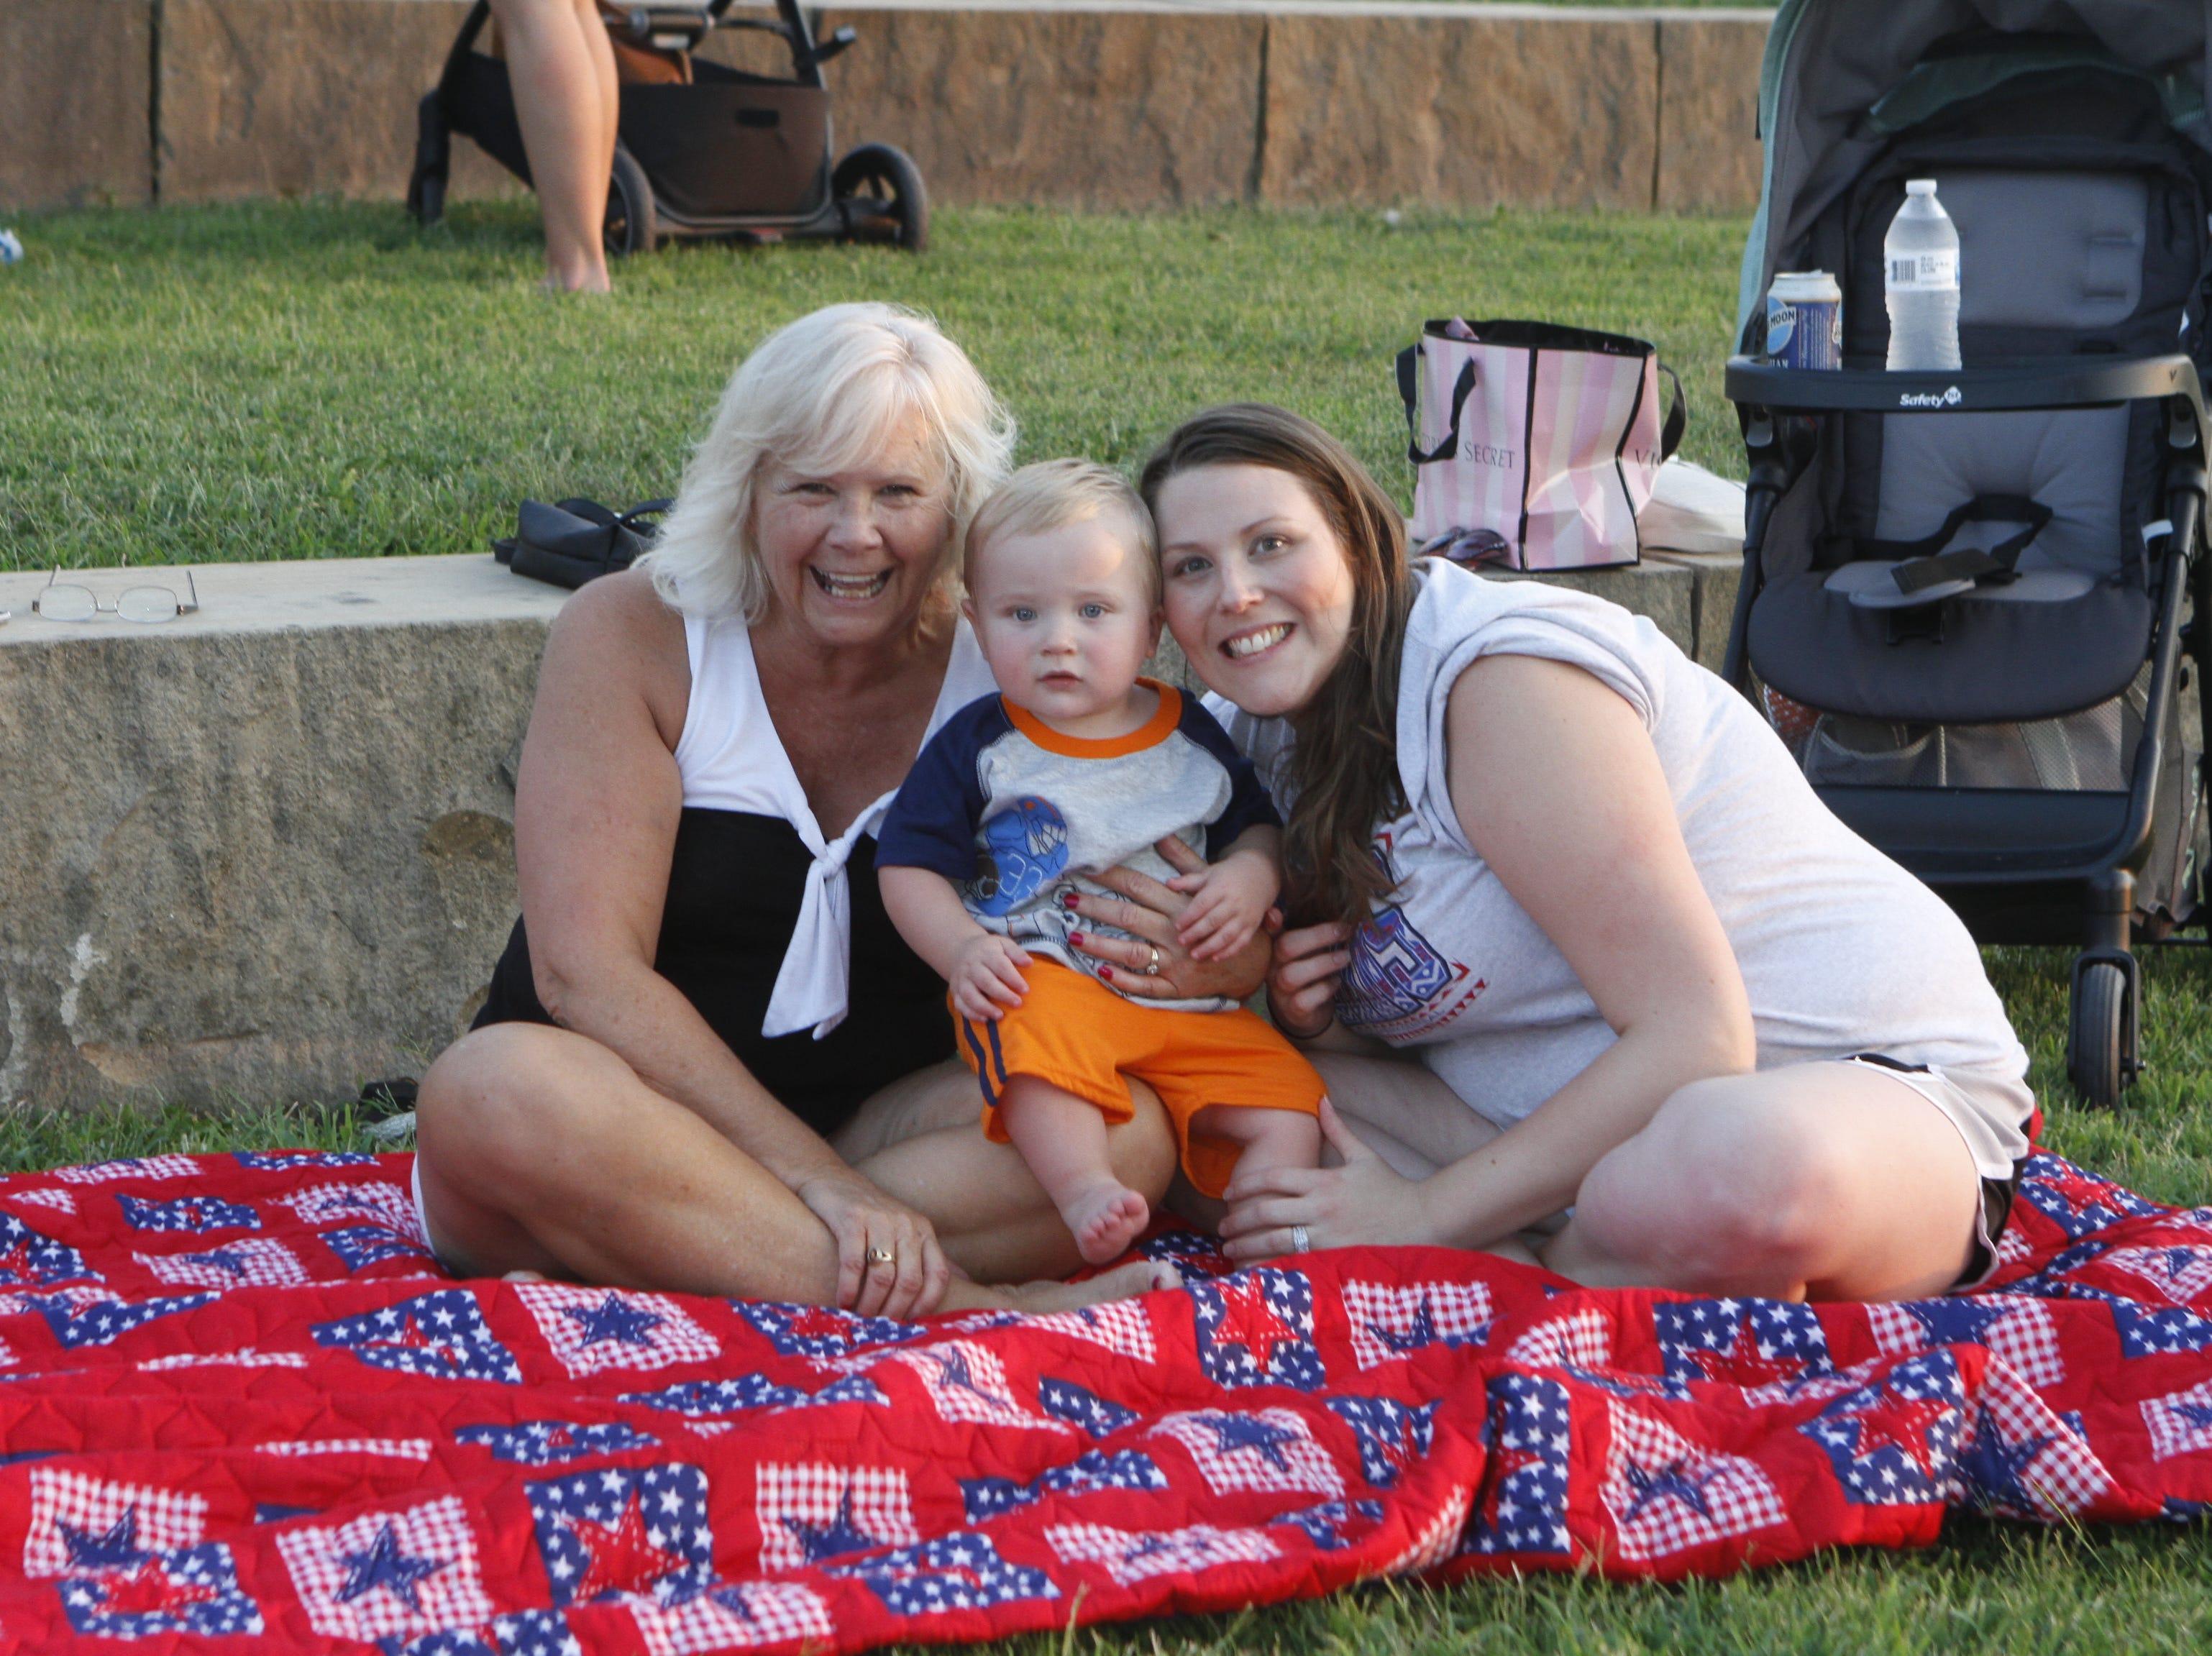 Nancy Poff Cooper and Kristen Dalton at Saturday's Road to Riverfest, a Liberty Park summer concert series event.